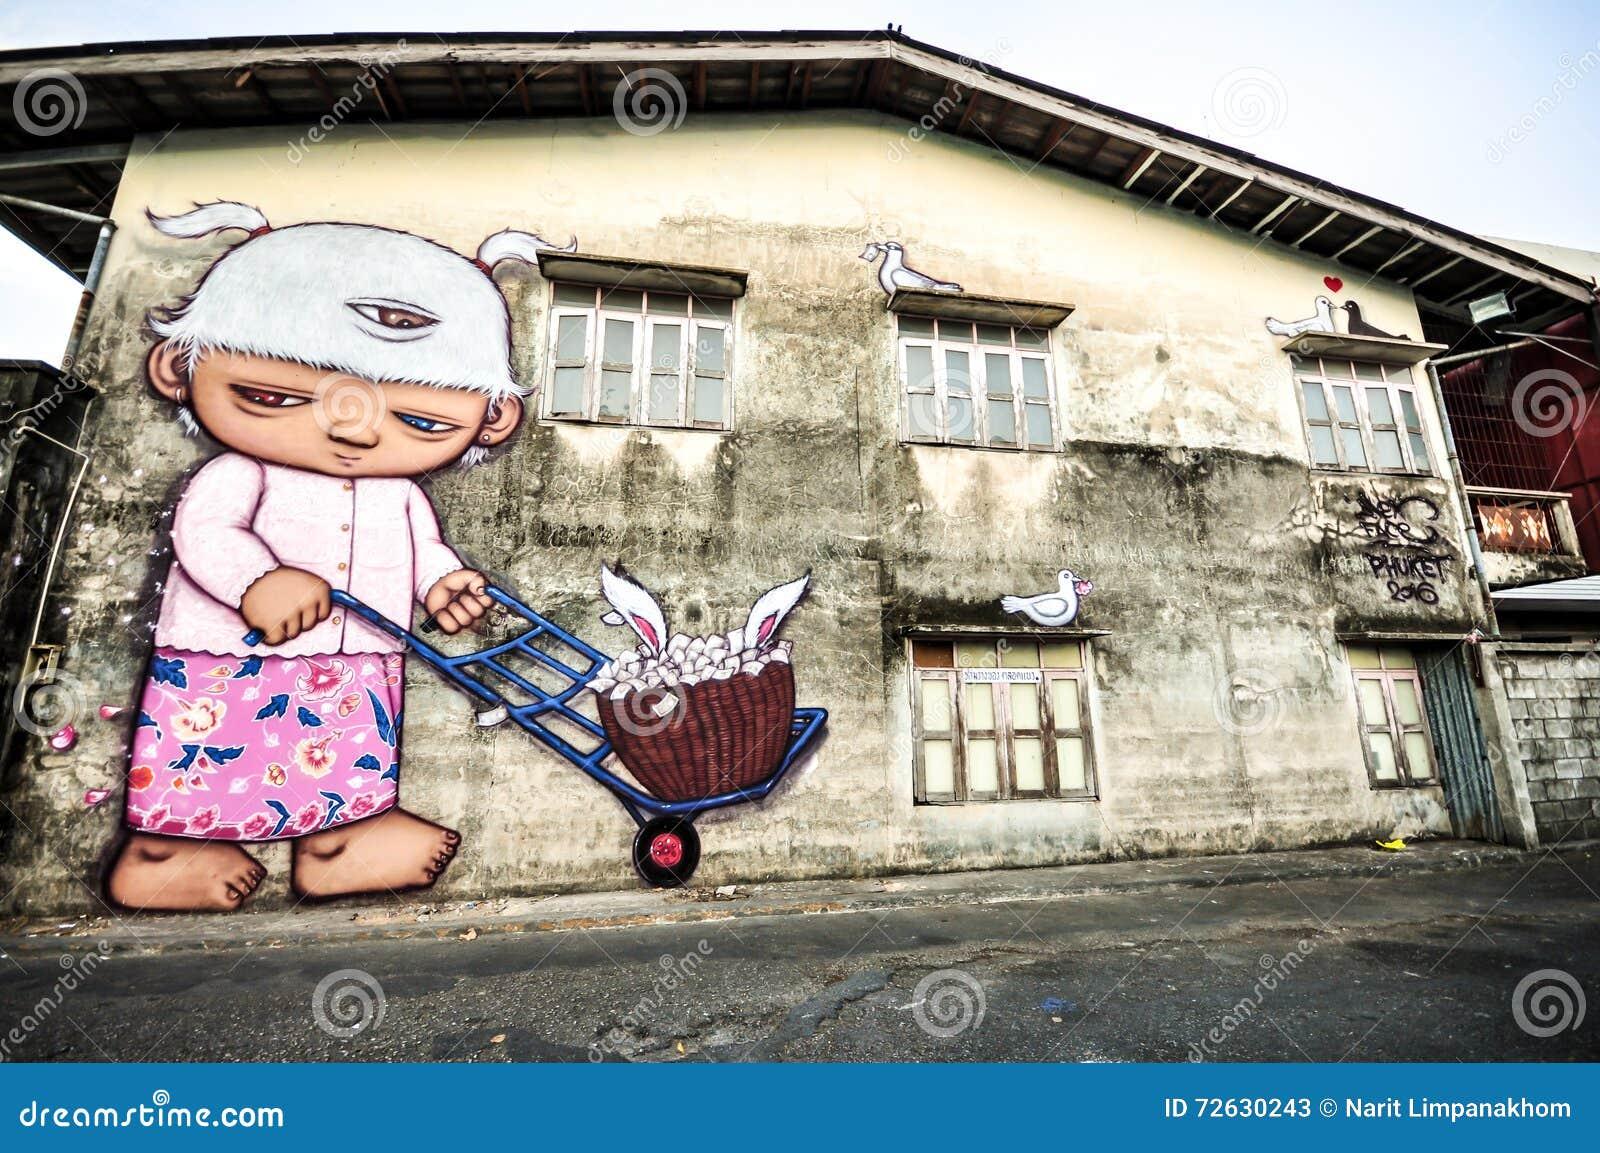 Street art phuket town 100